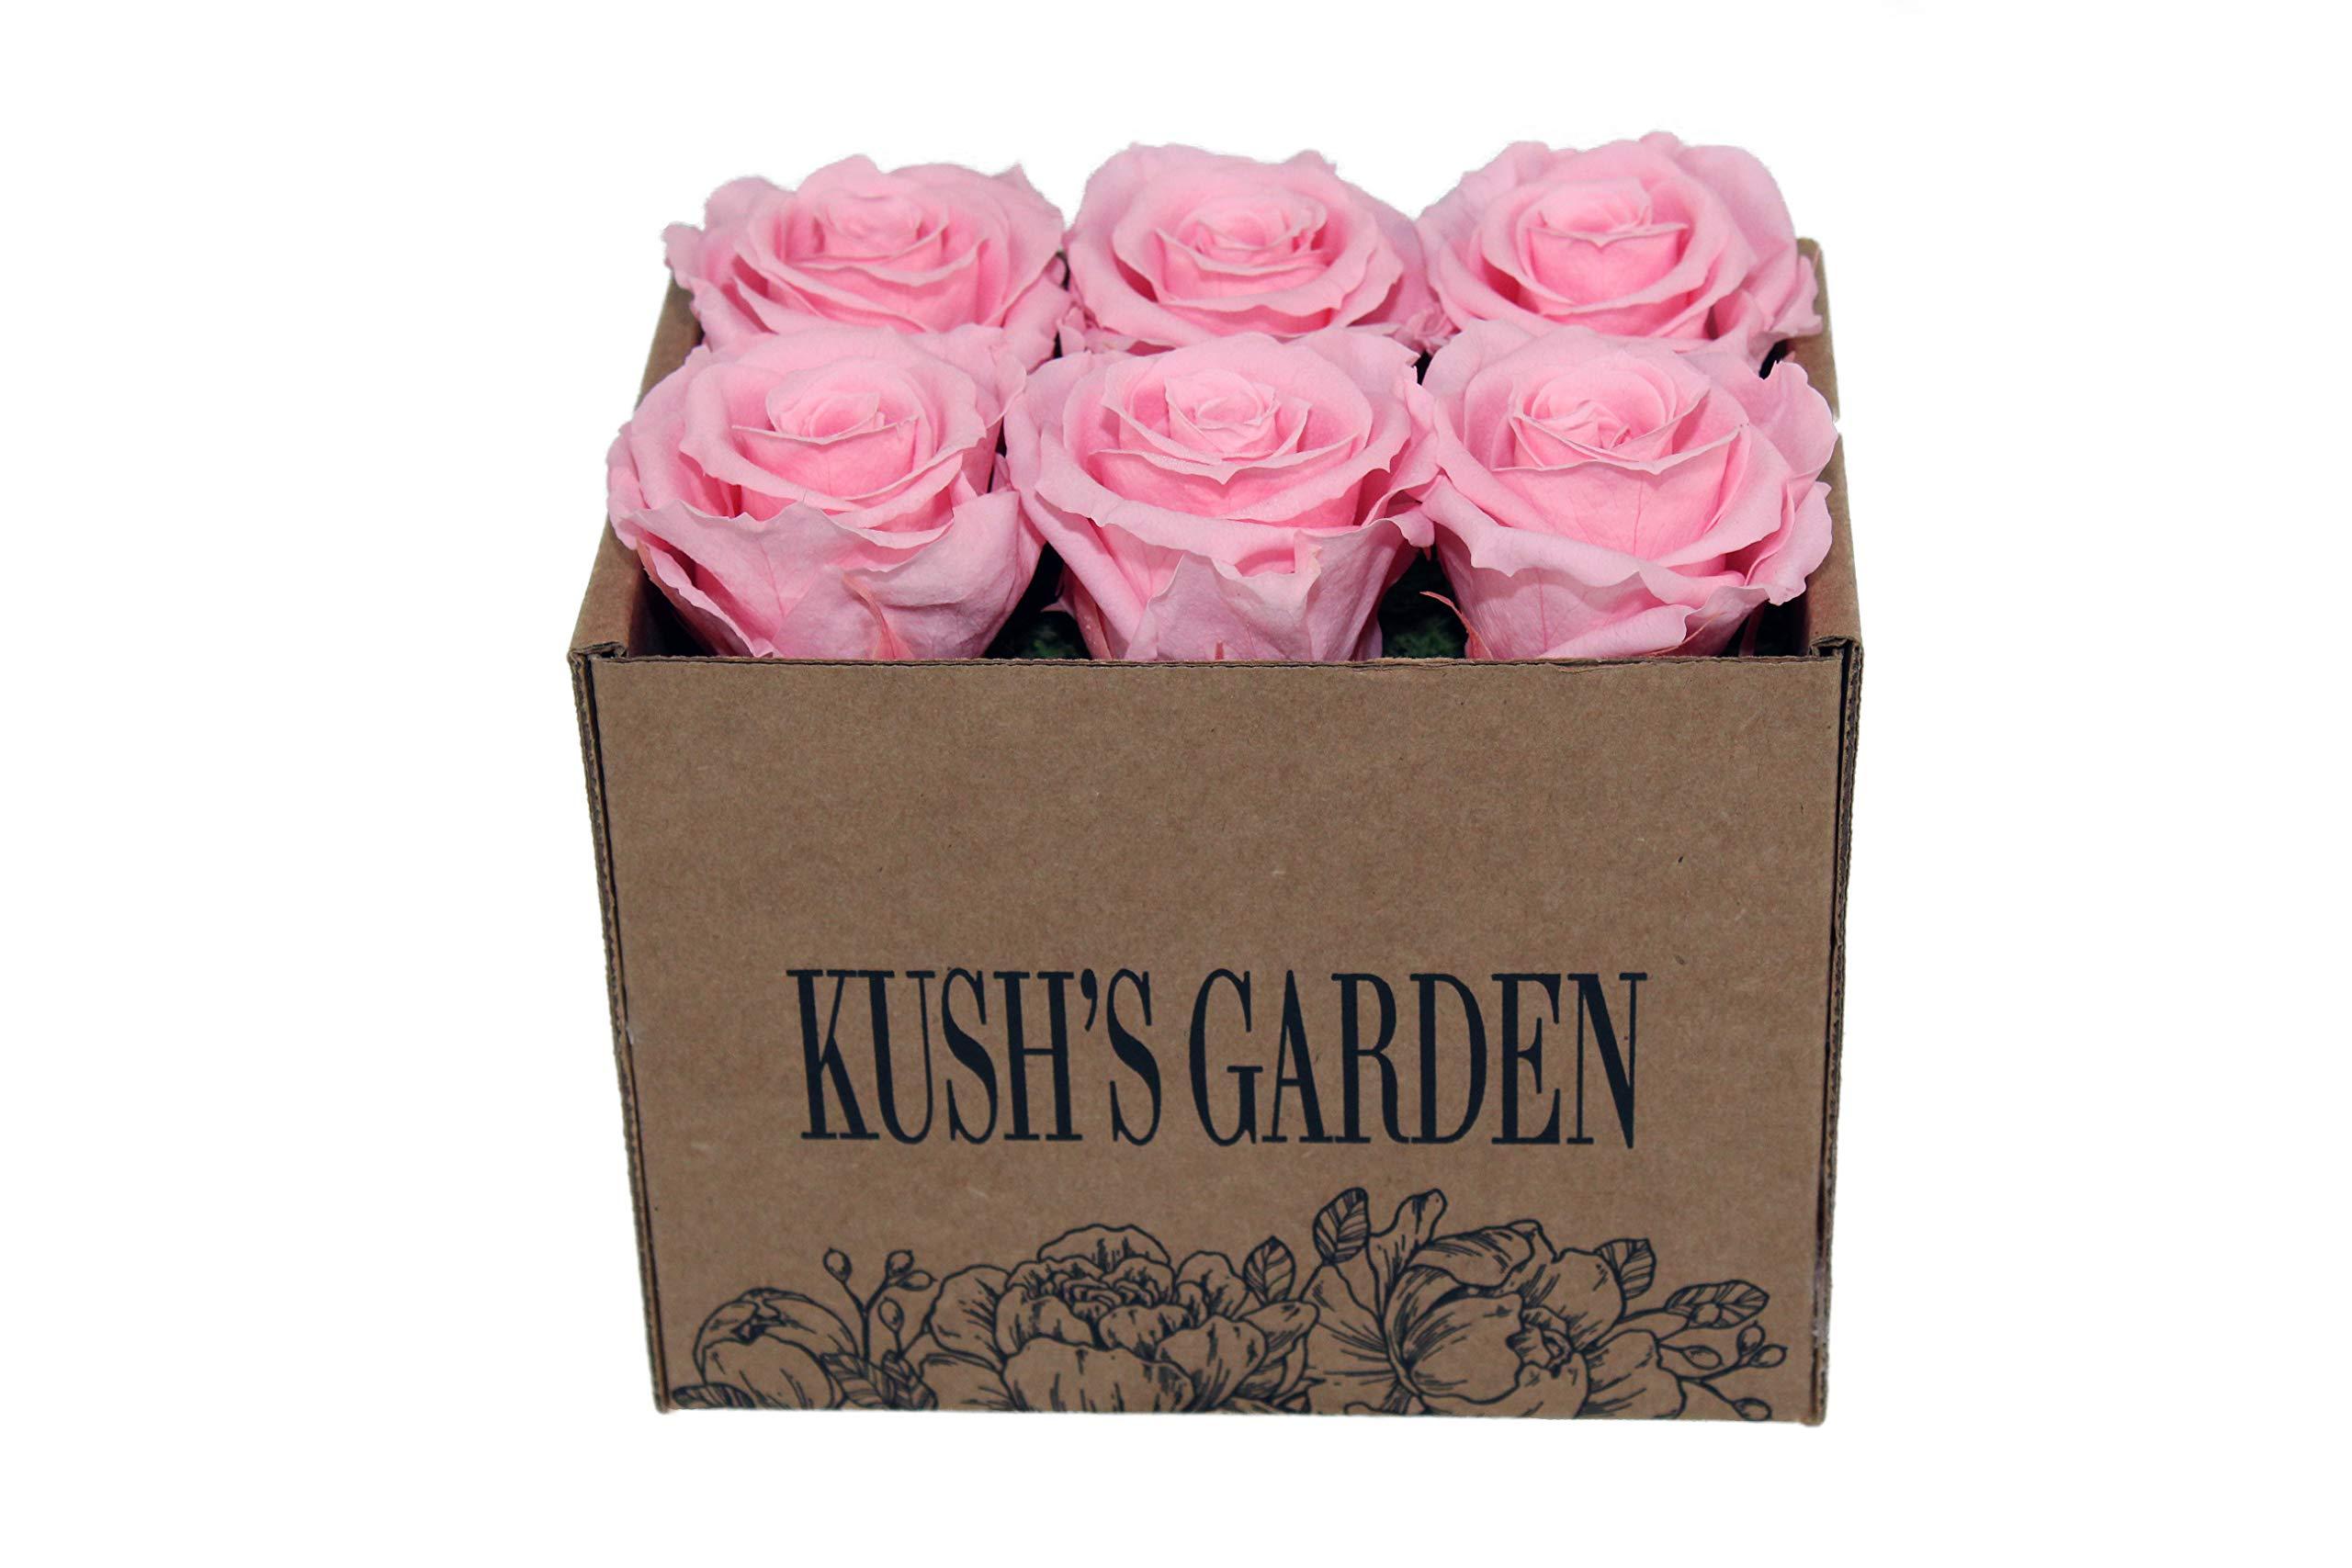 KUSHS GARDEN Real Preserved Roses in Box (Pink Princess)